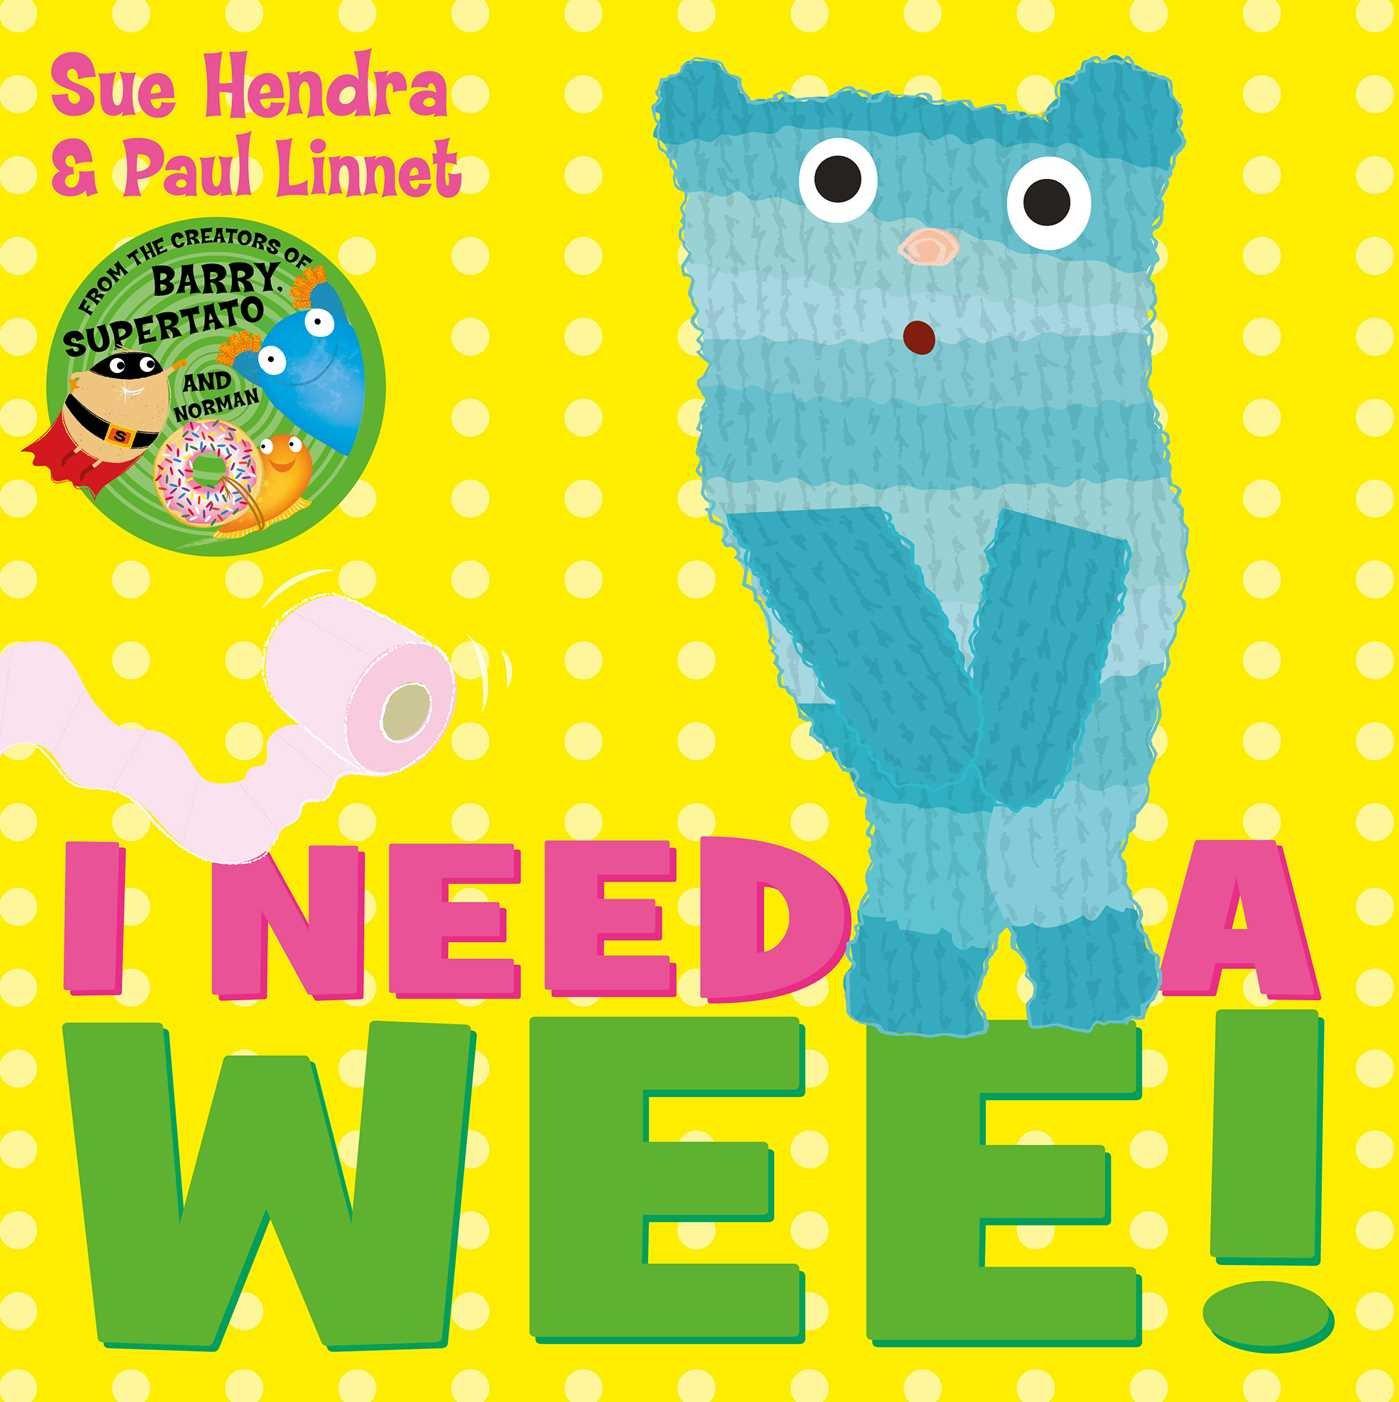 I Need a Wee!: Amazon.co.uk: Hendra, Sue, Linnet, Paul: Books